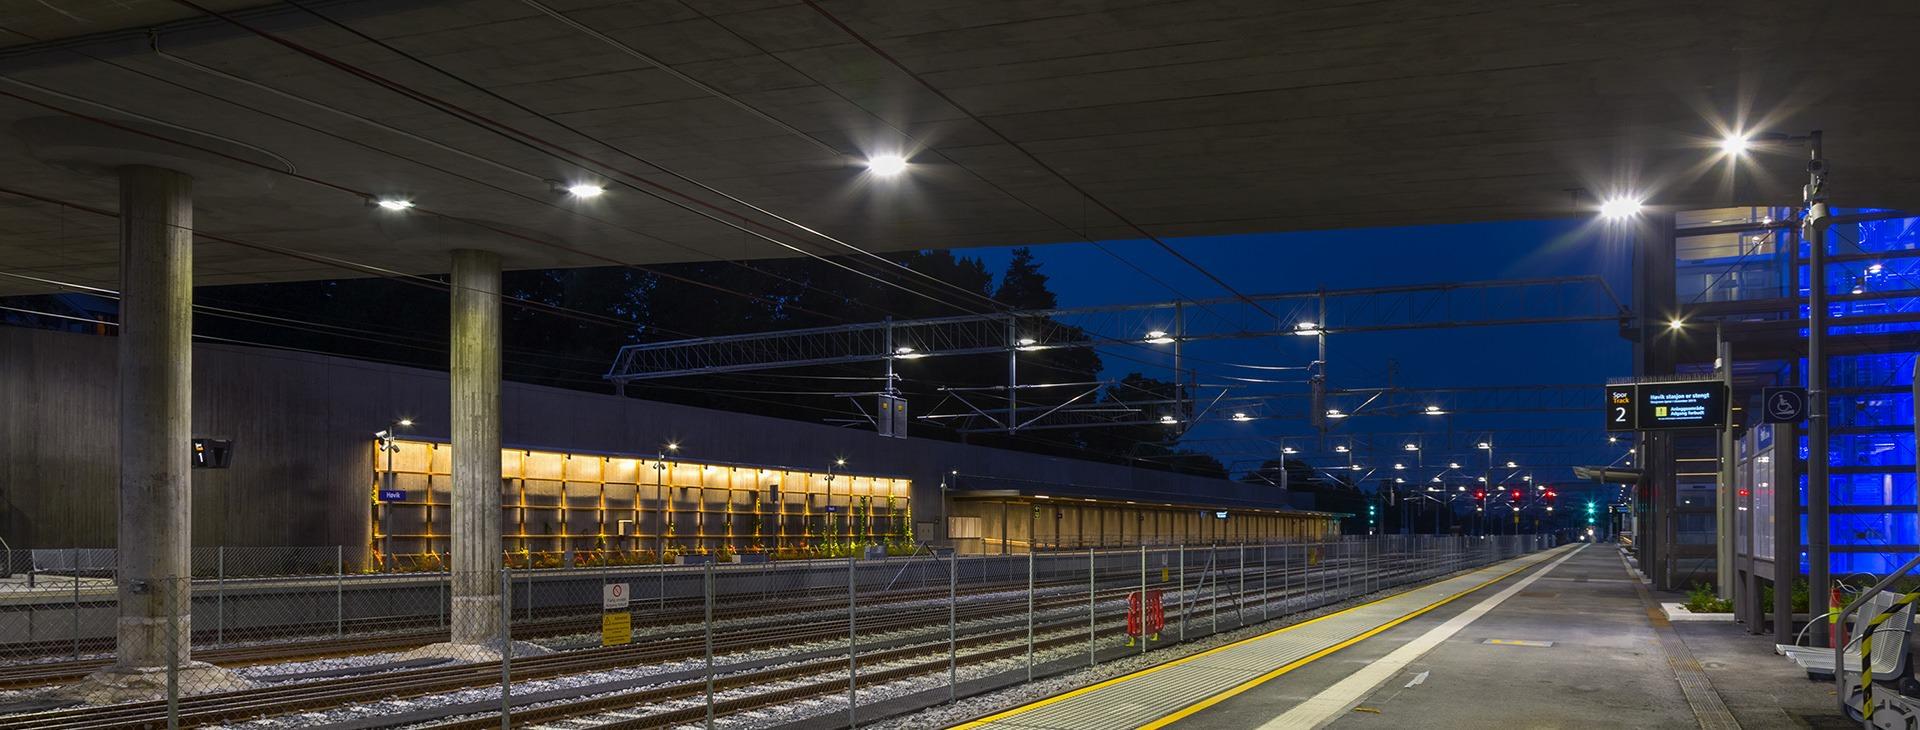 Spoortunnel - stations - emplacementen